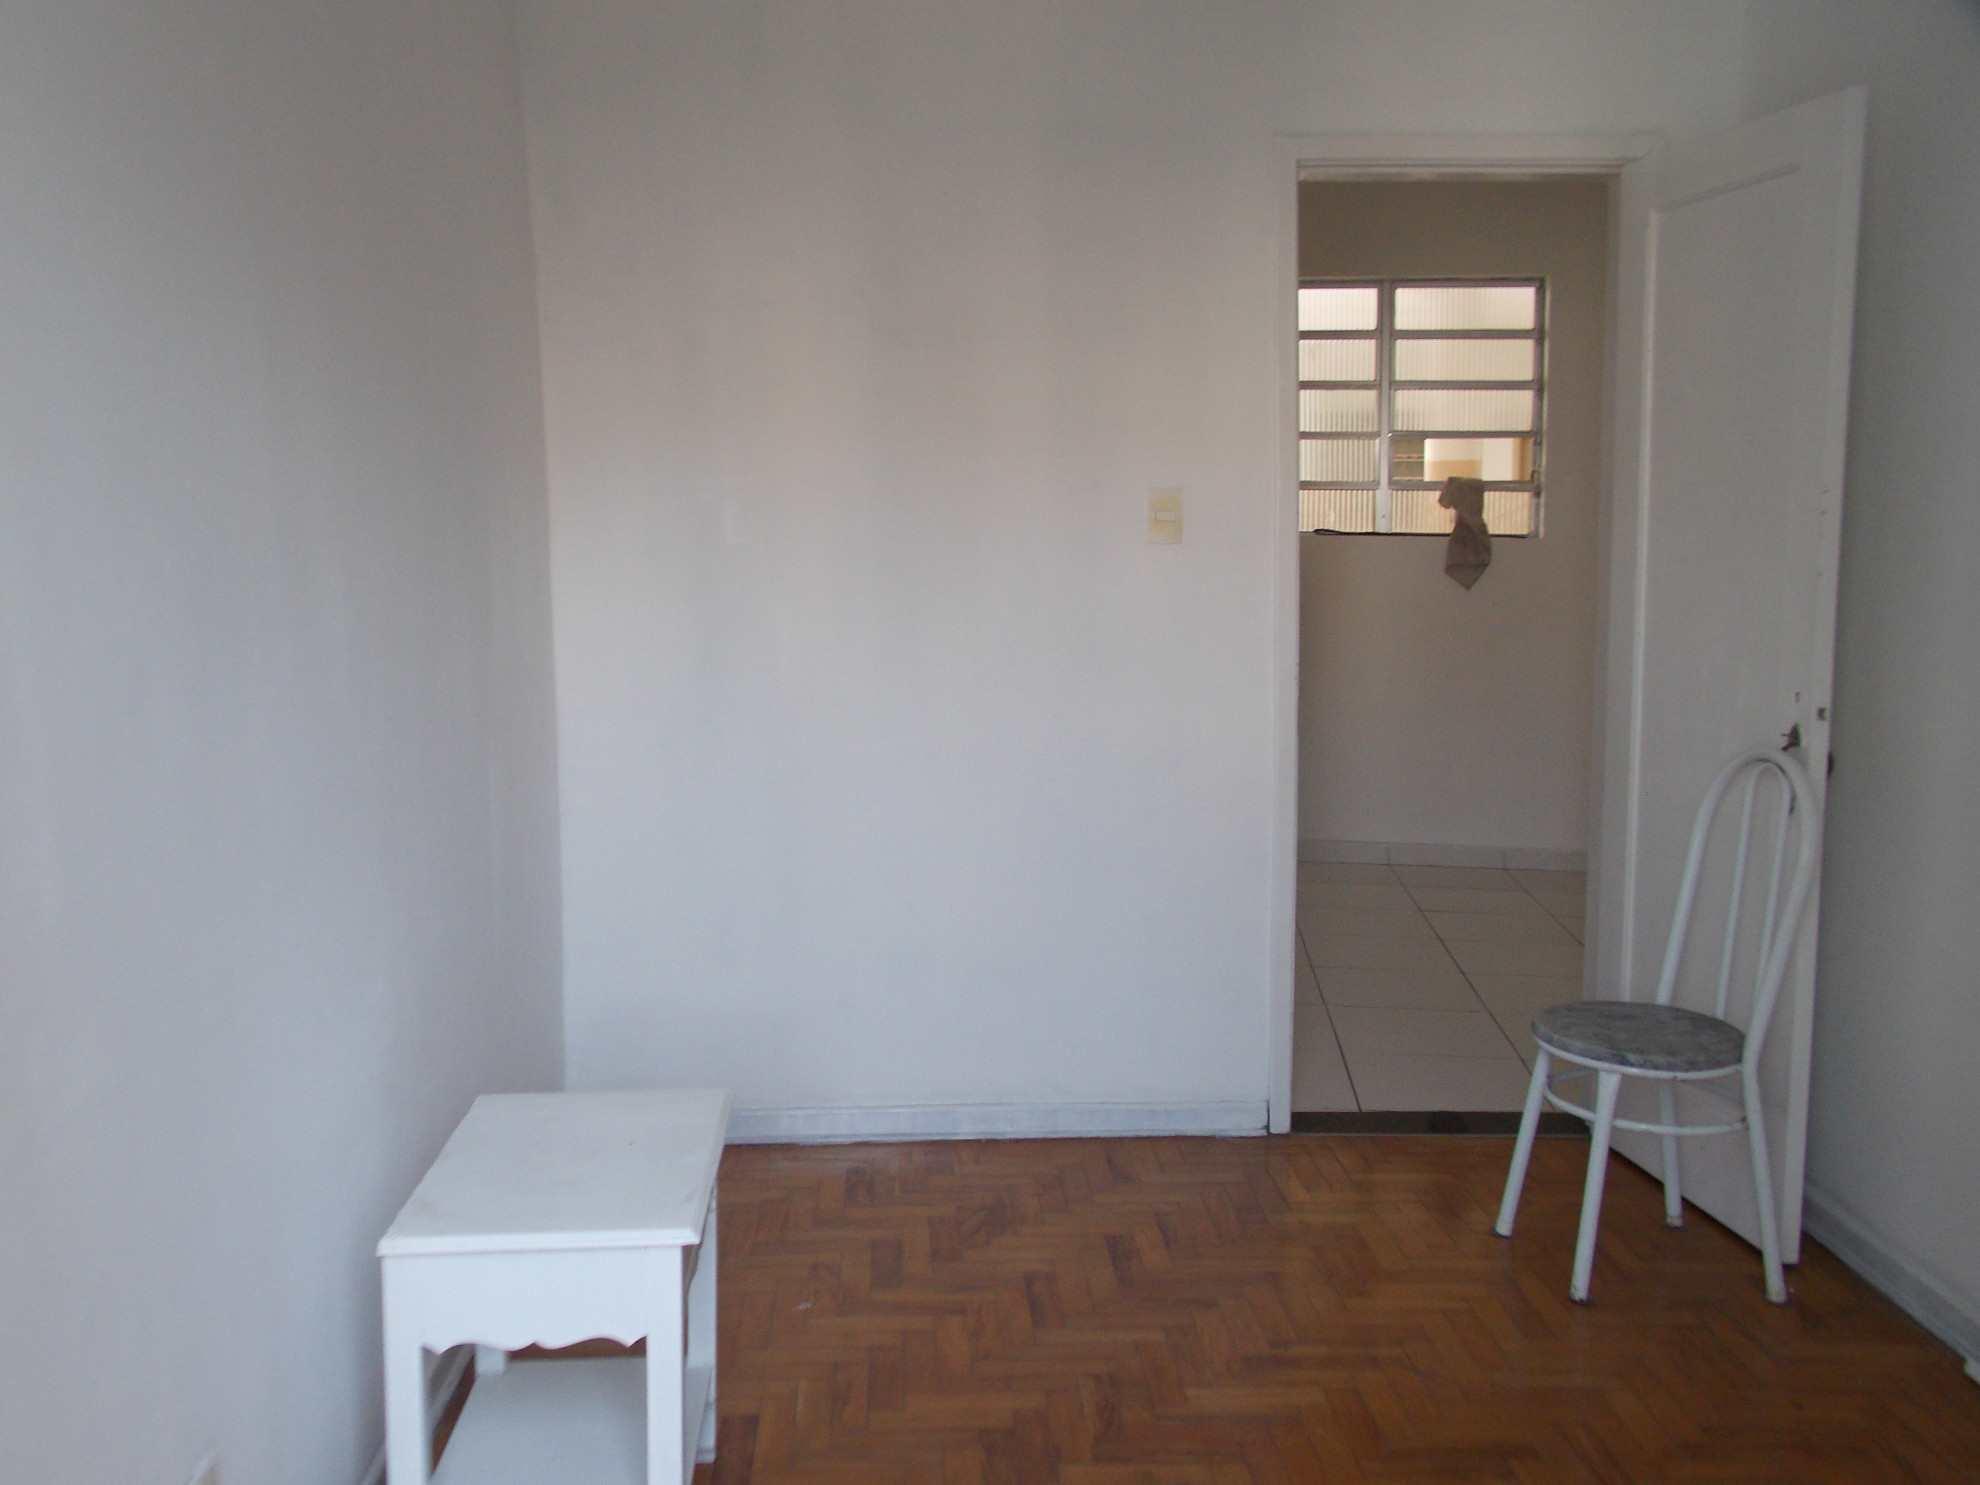 D - Dormitorio (4)